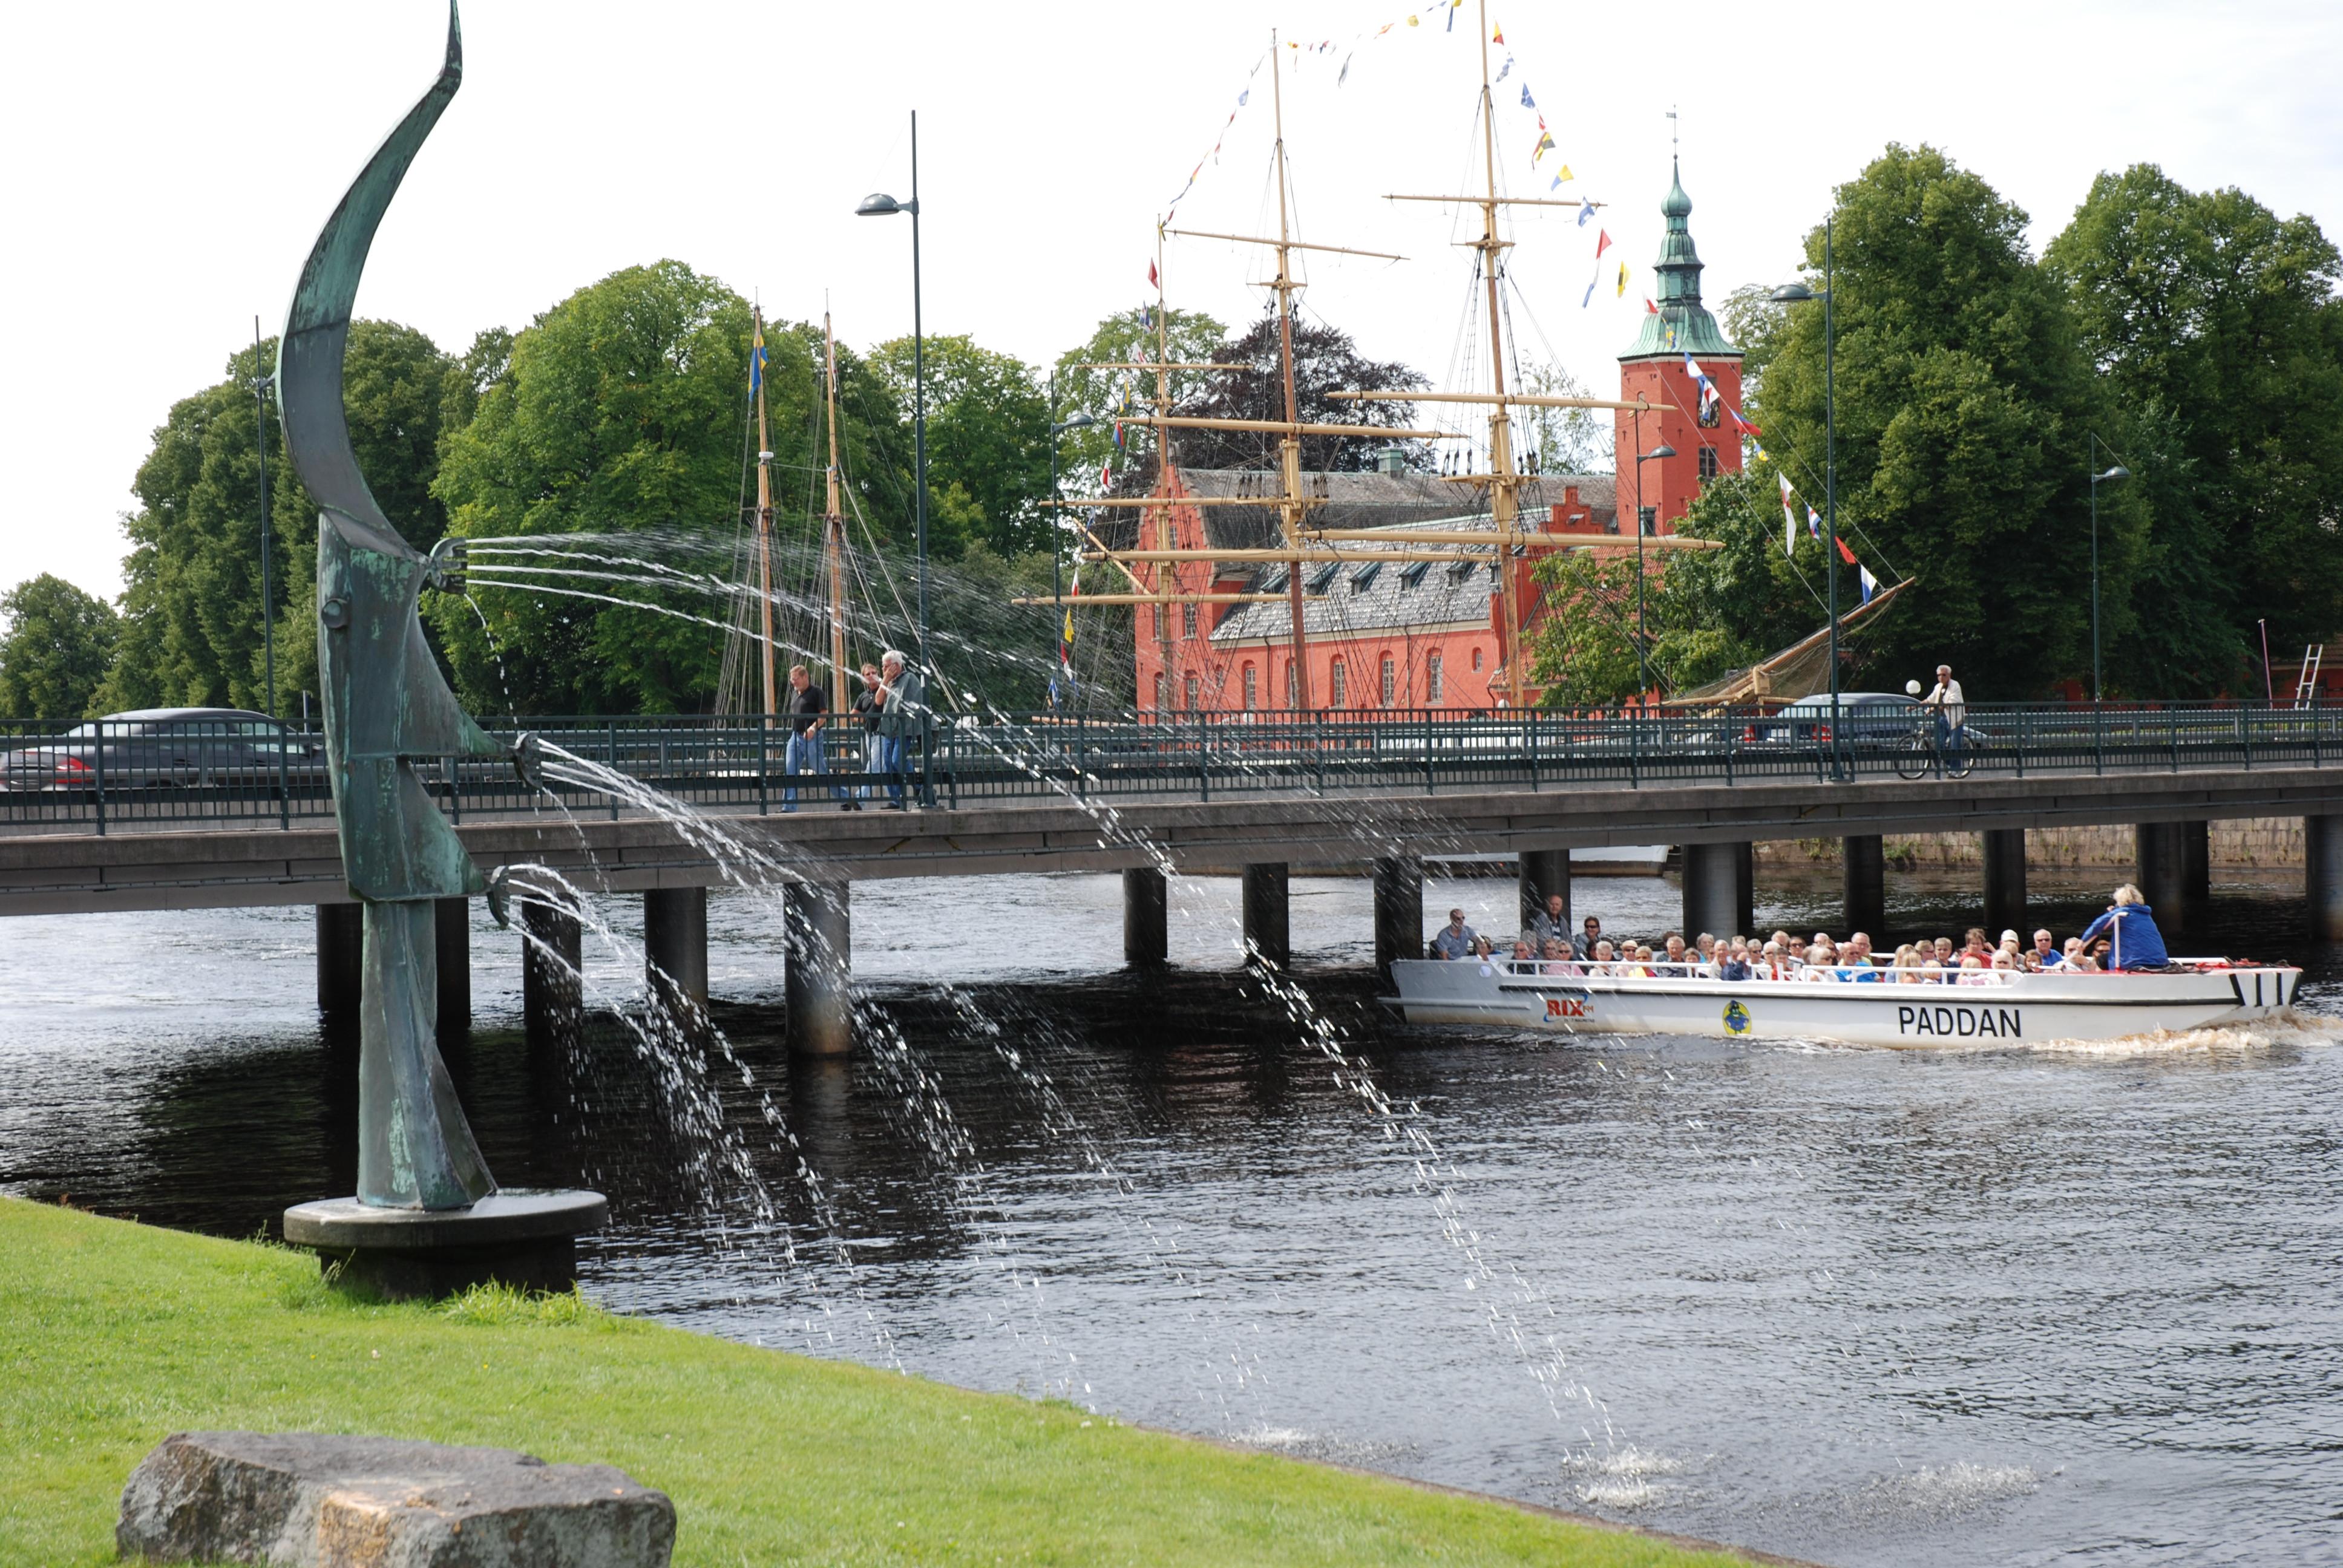 gratis kontaktsidor dating stockholm